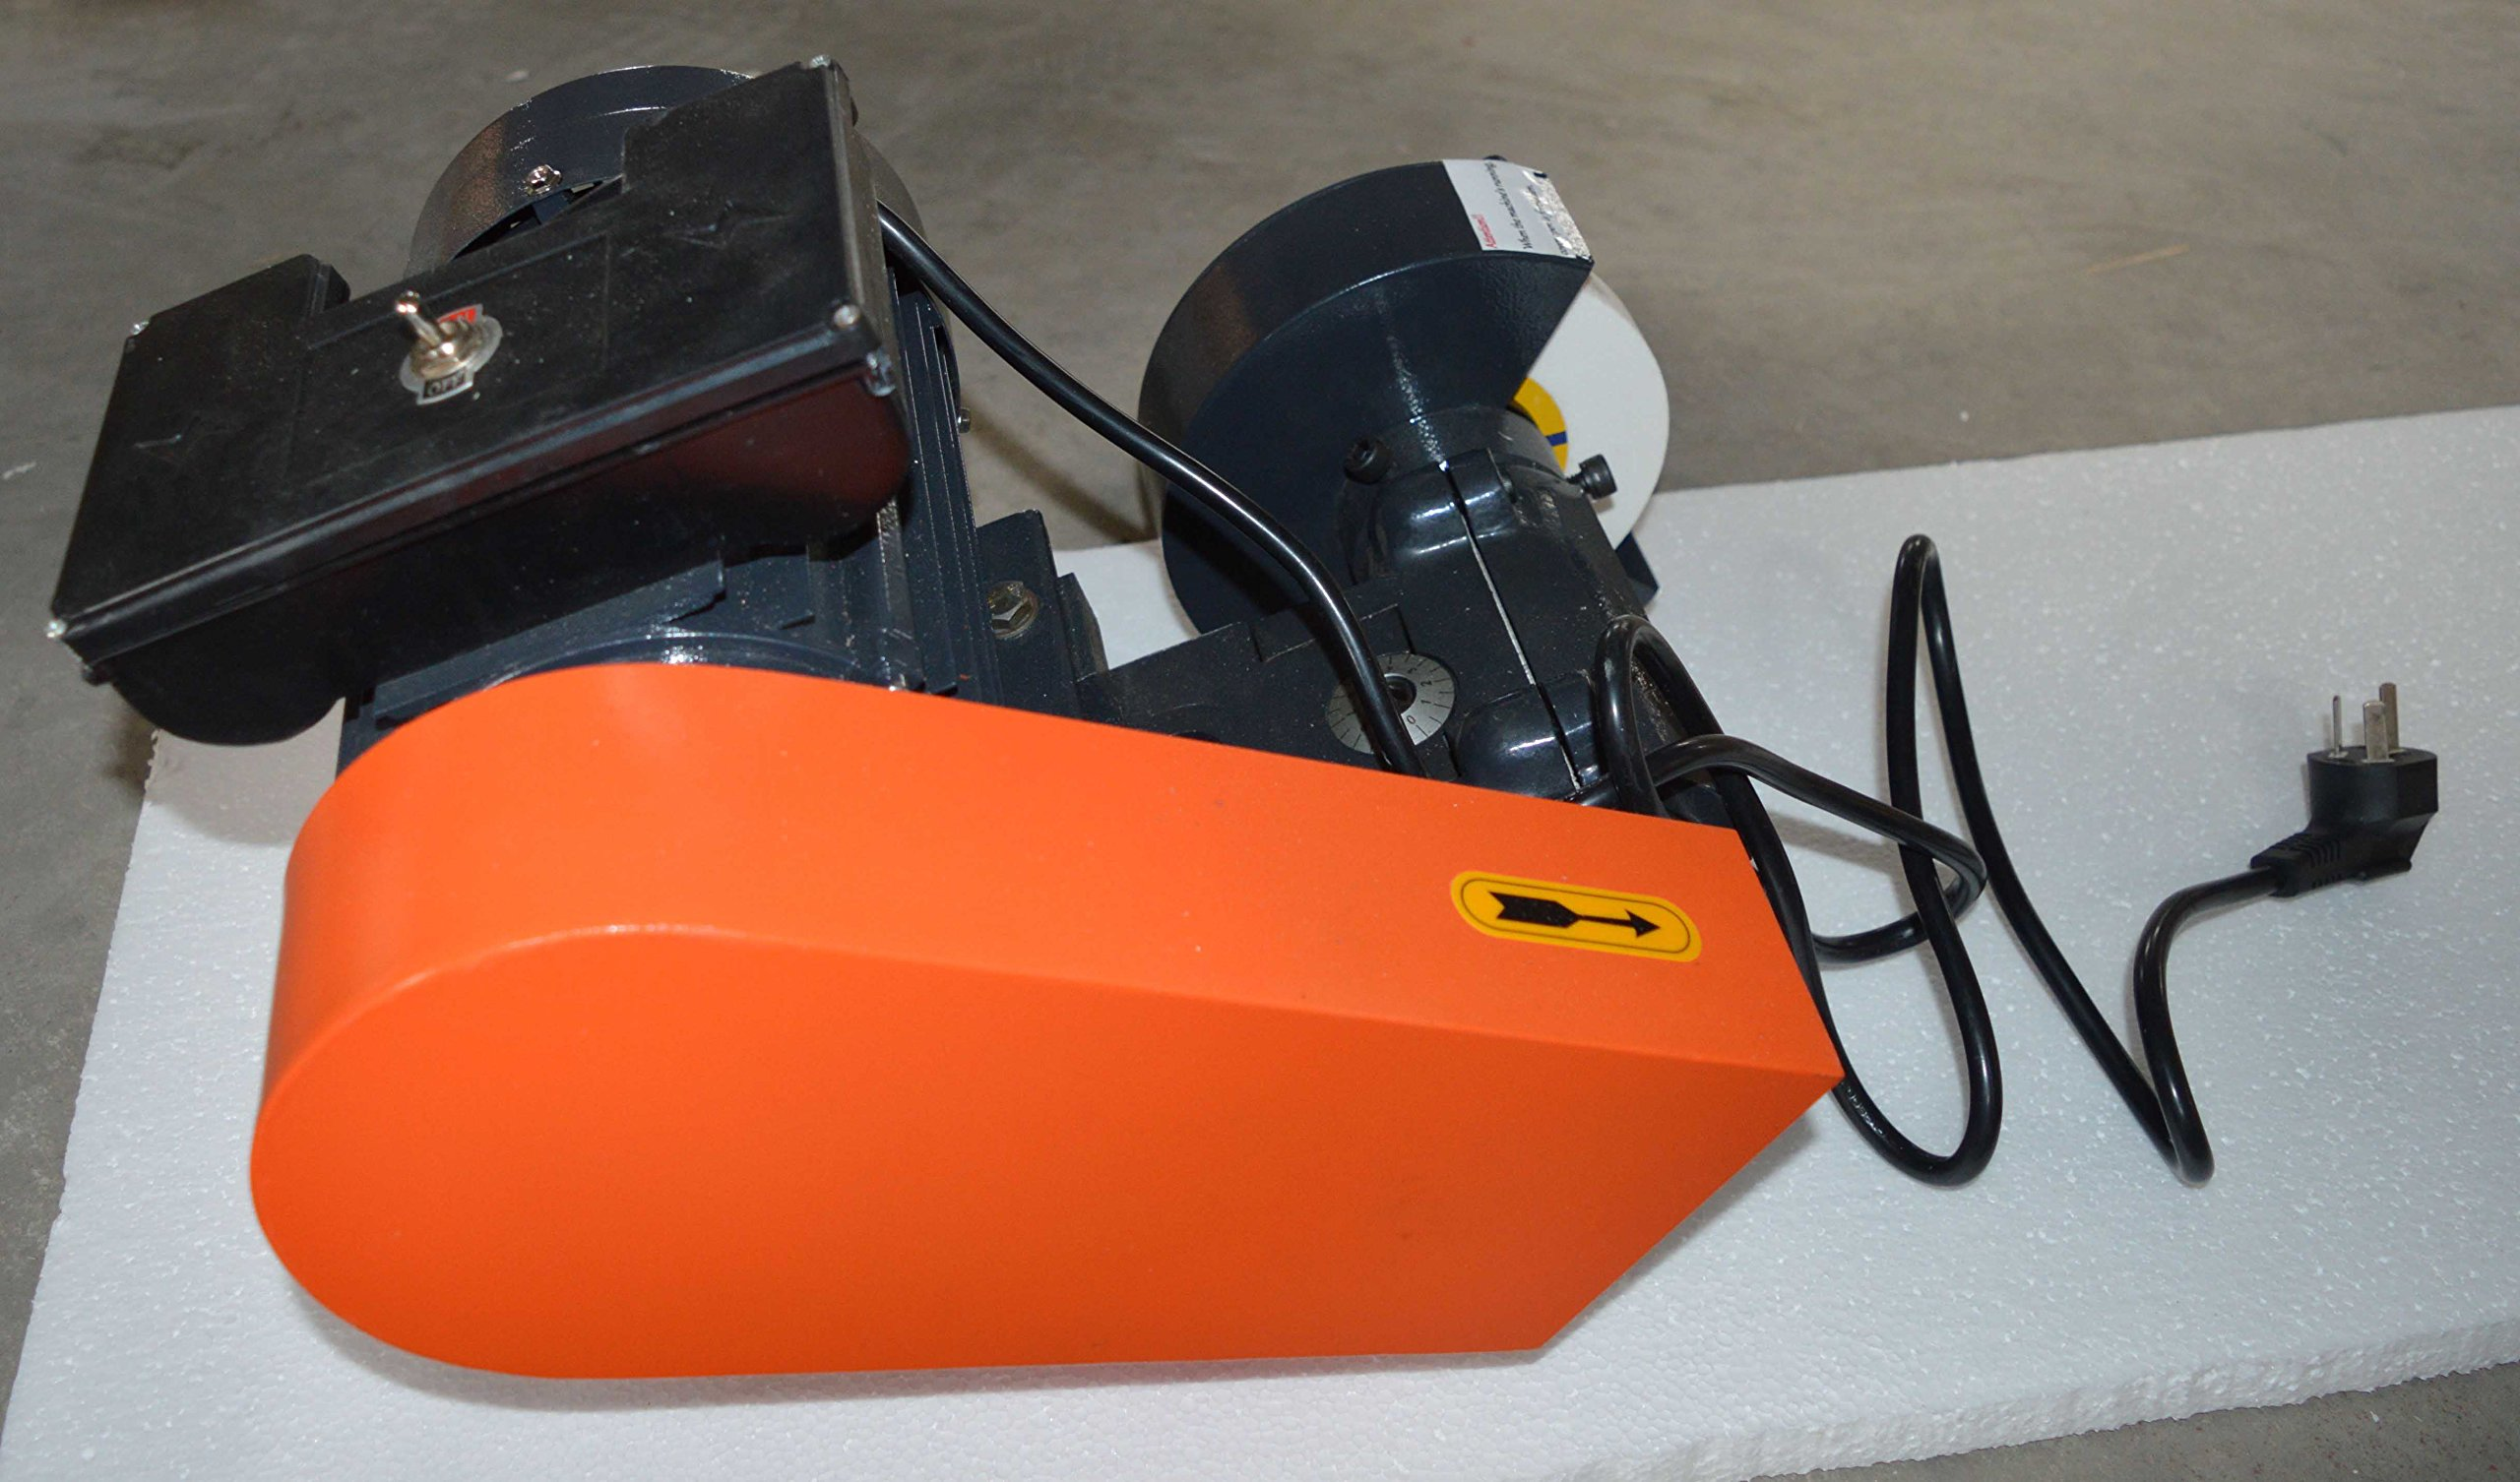 220V Lathe Tool Post Grinder Internal and External Sharpener Grinding Machine 1100W